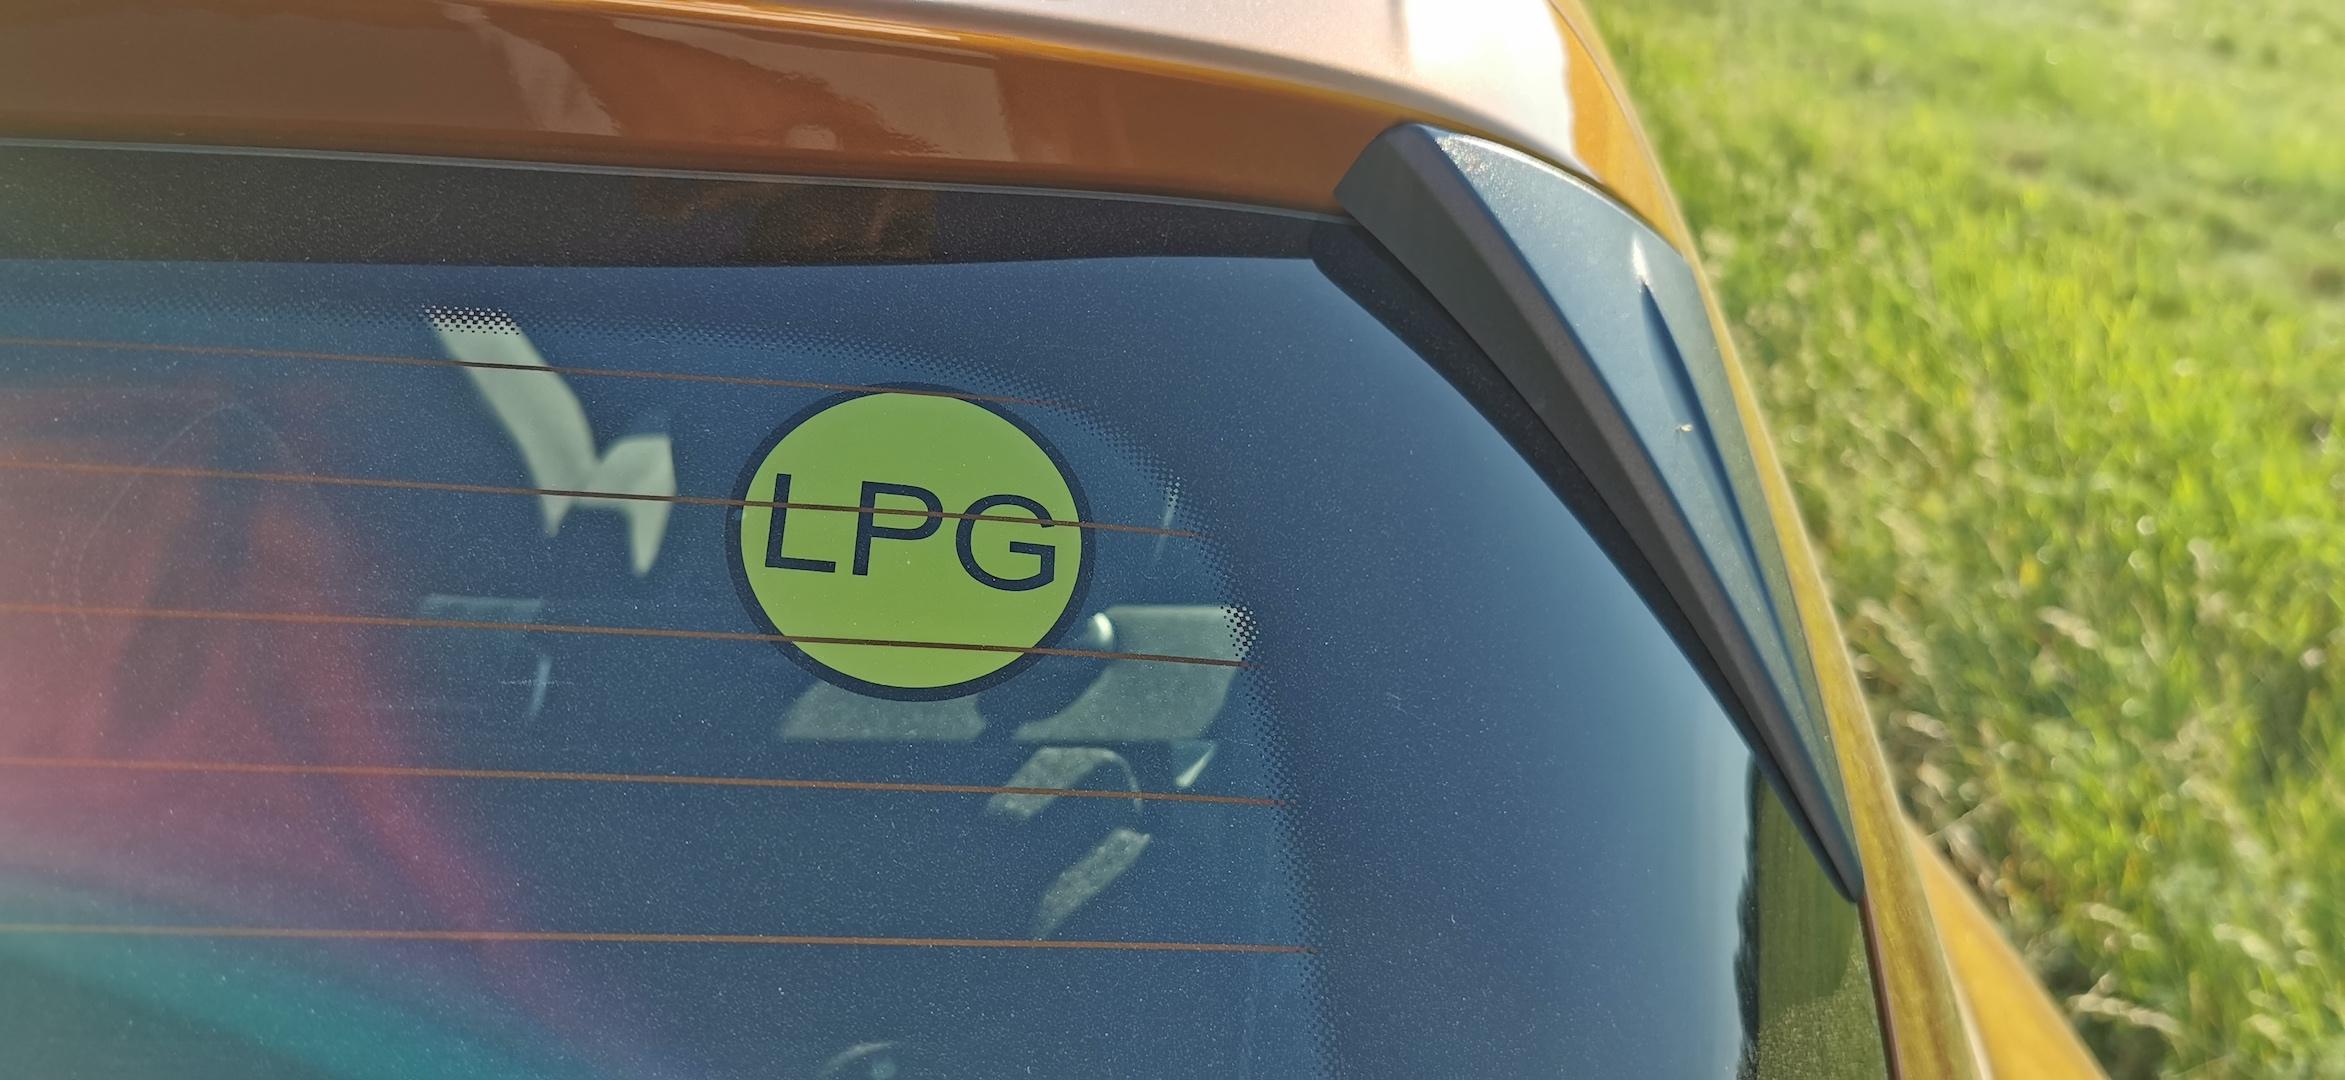 Dacia Sandero Stepway 1,0 TCe LPG - samolepka LPG